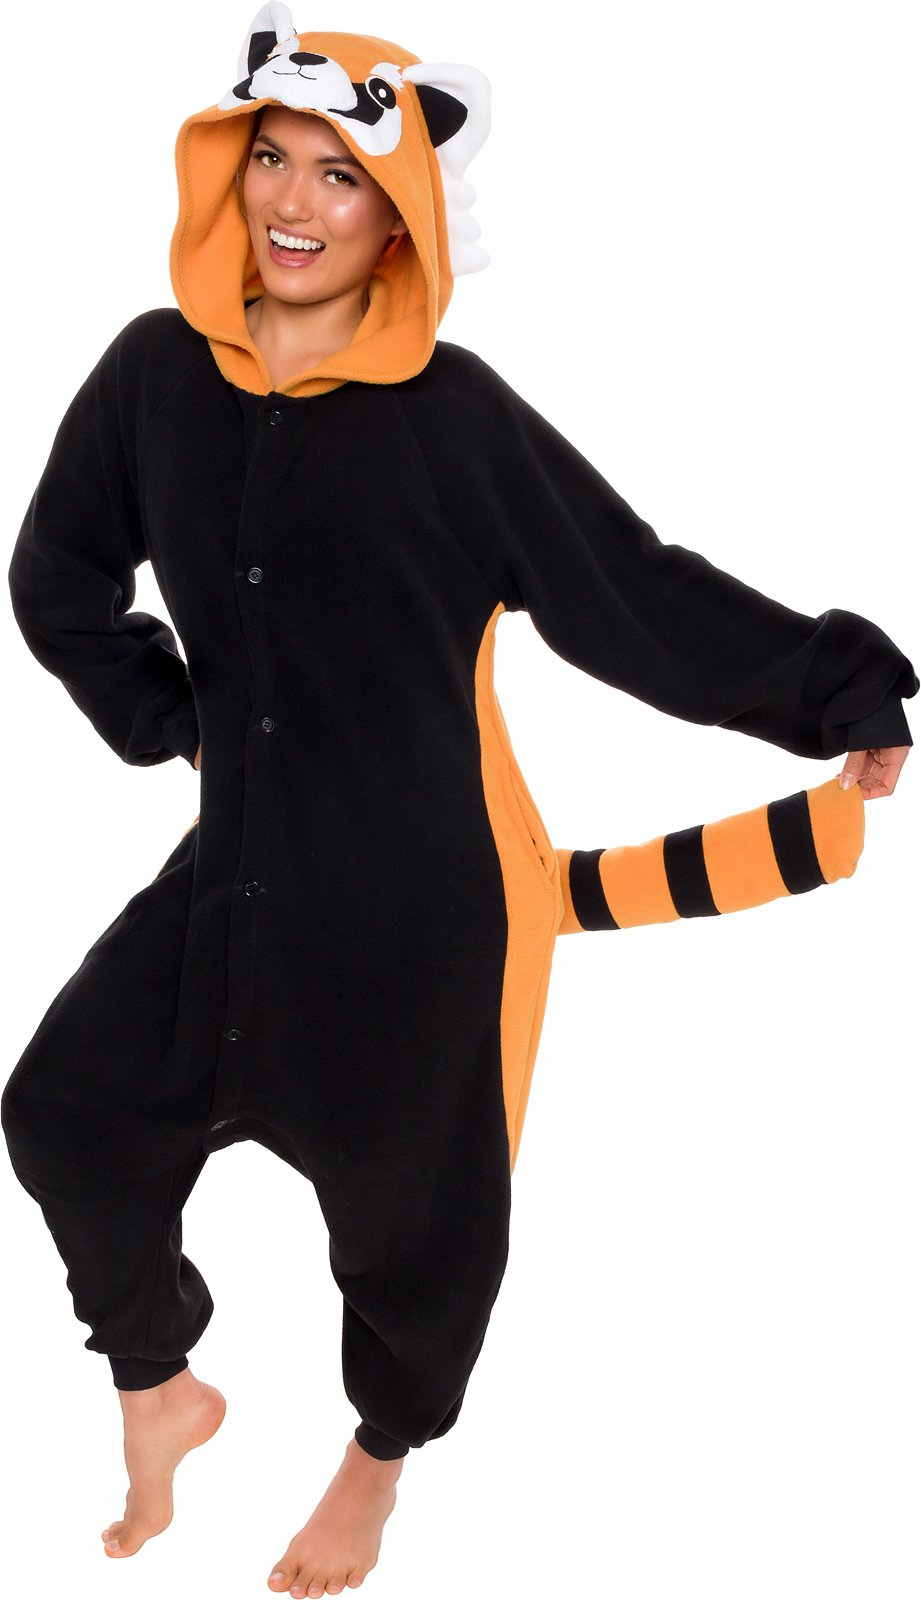 Silver Lilly Unisex Adult Pajamas - Plush One Piece Cosplay Red Panda Animal Costume (Black/Orange, X-Large)